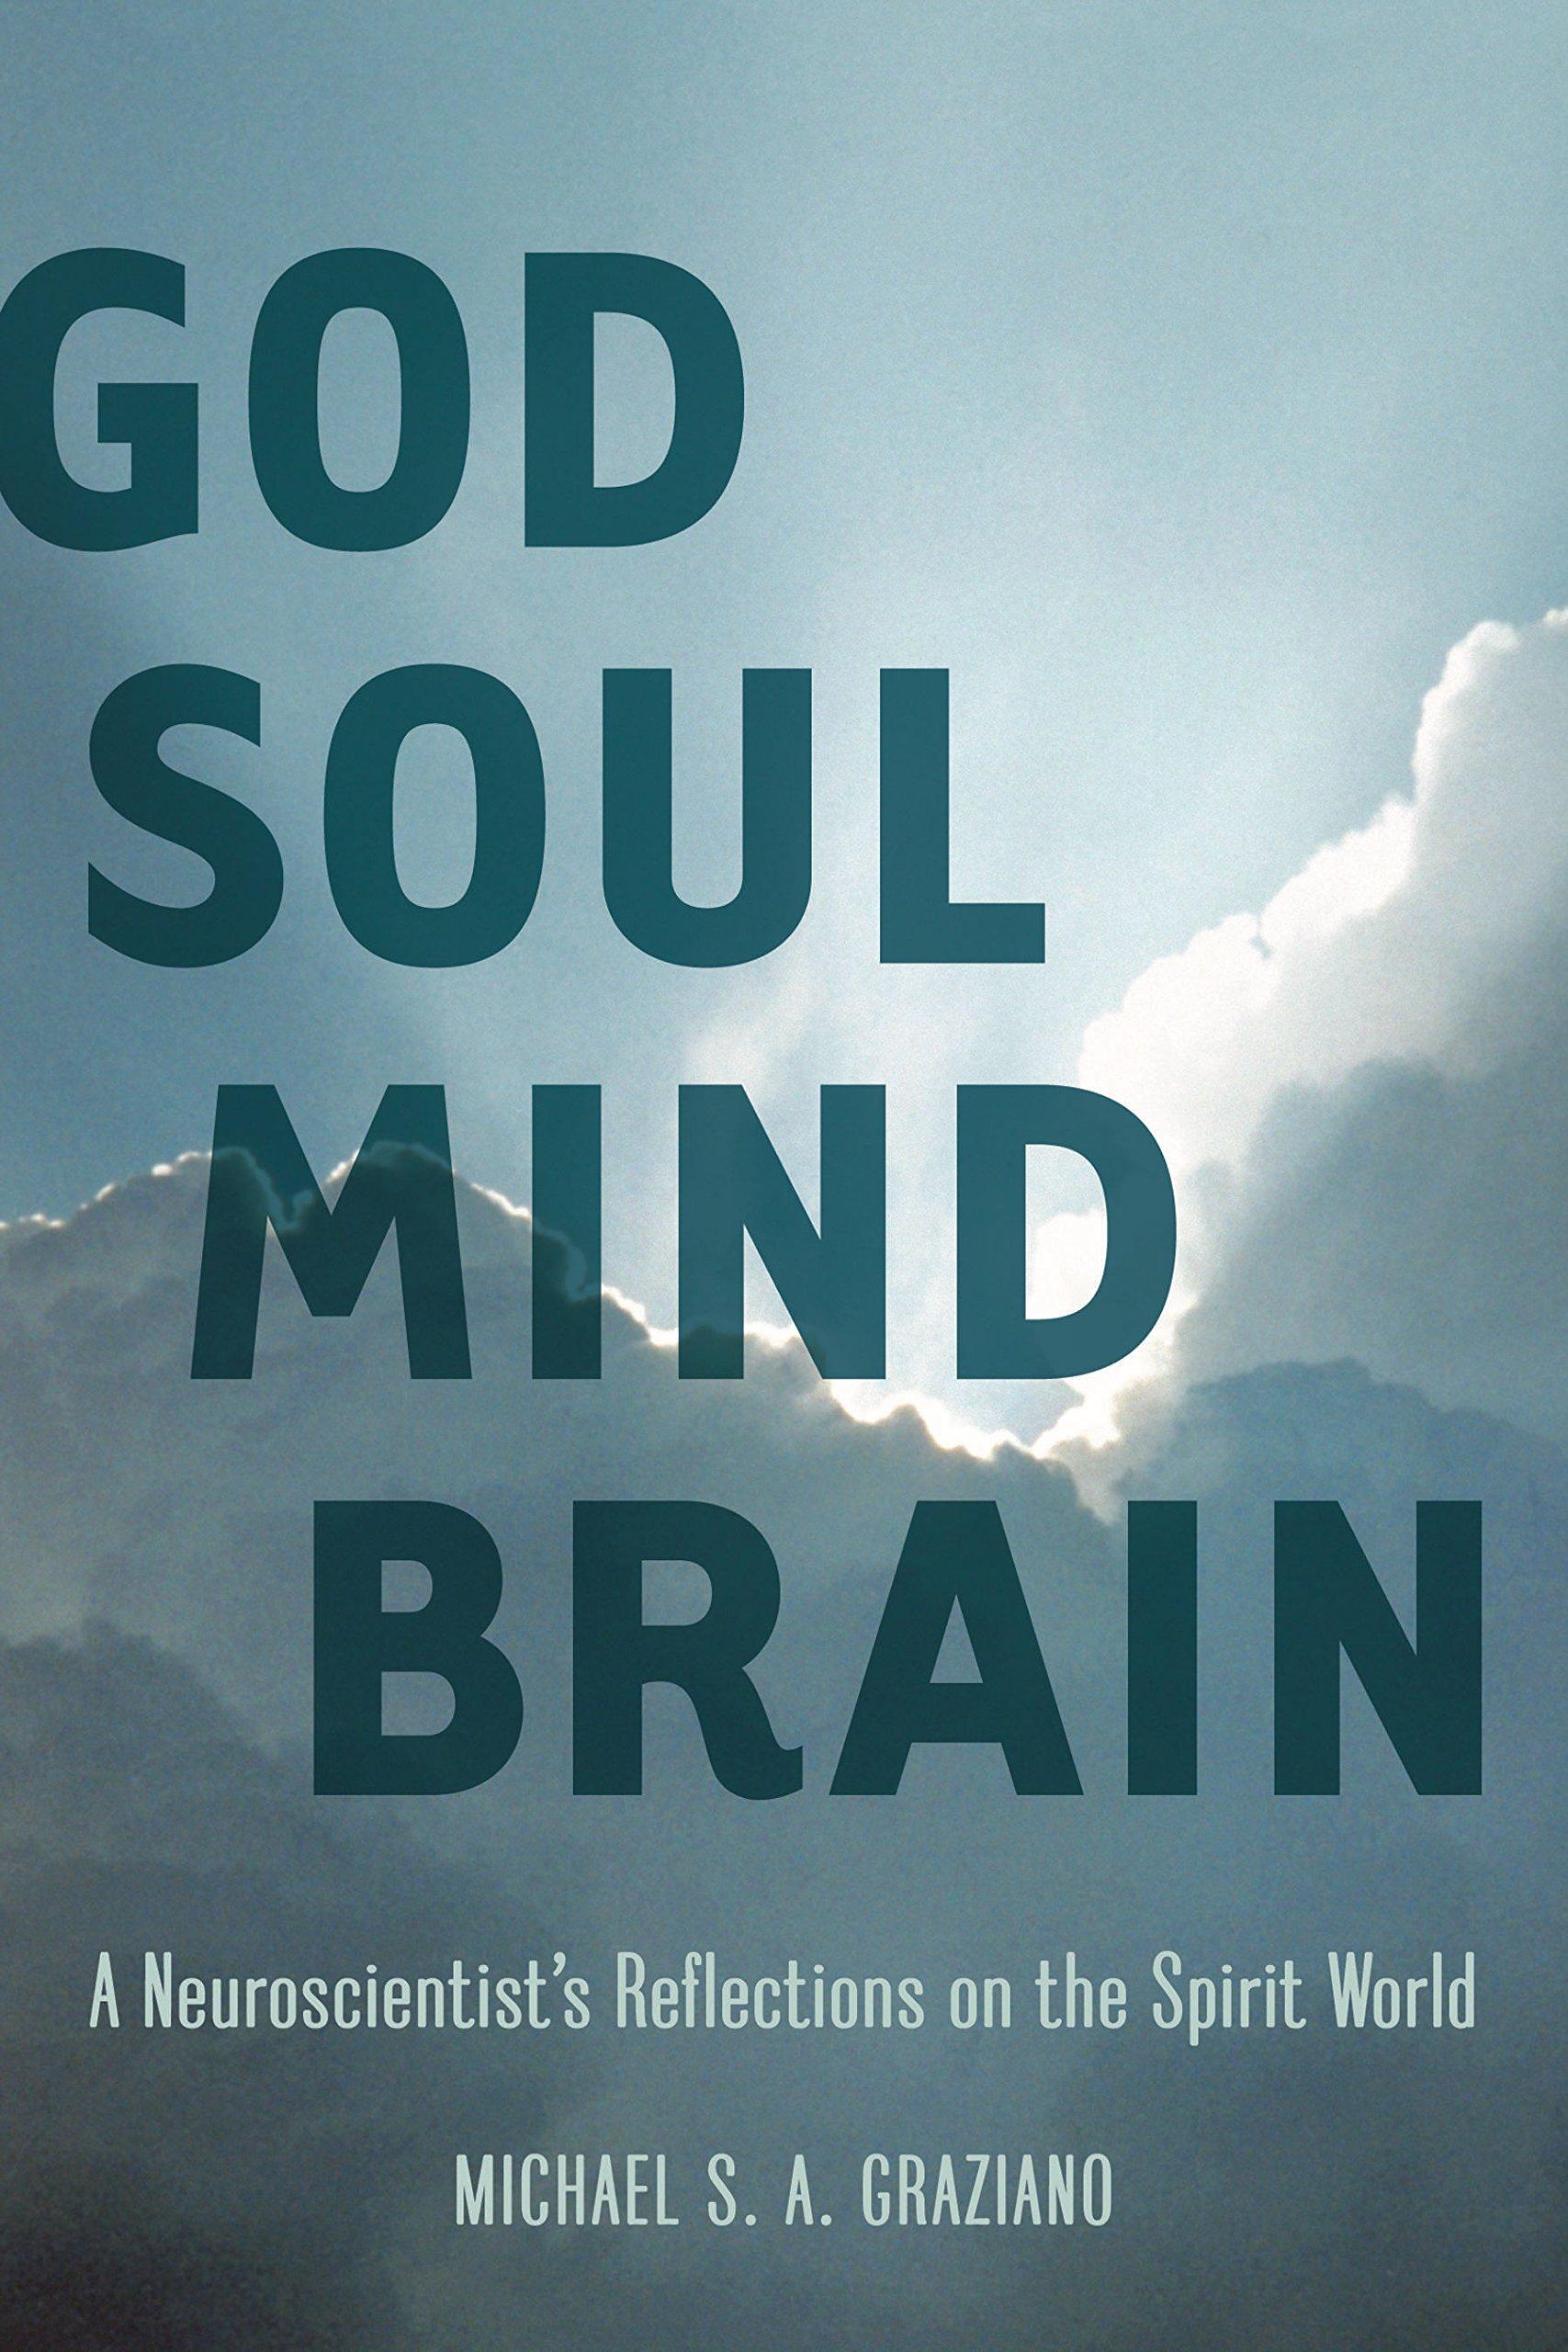 Neuroscientists Illuminate Role Of >> God Soul Mind Brain A Neuroscientist S Reflections On The Spirit